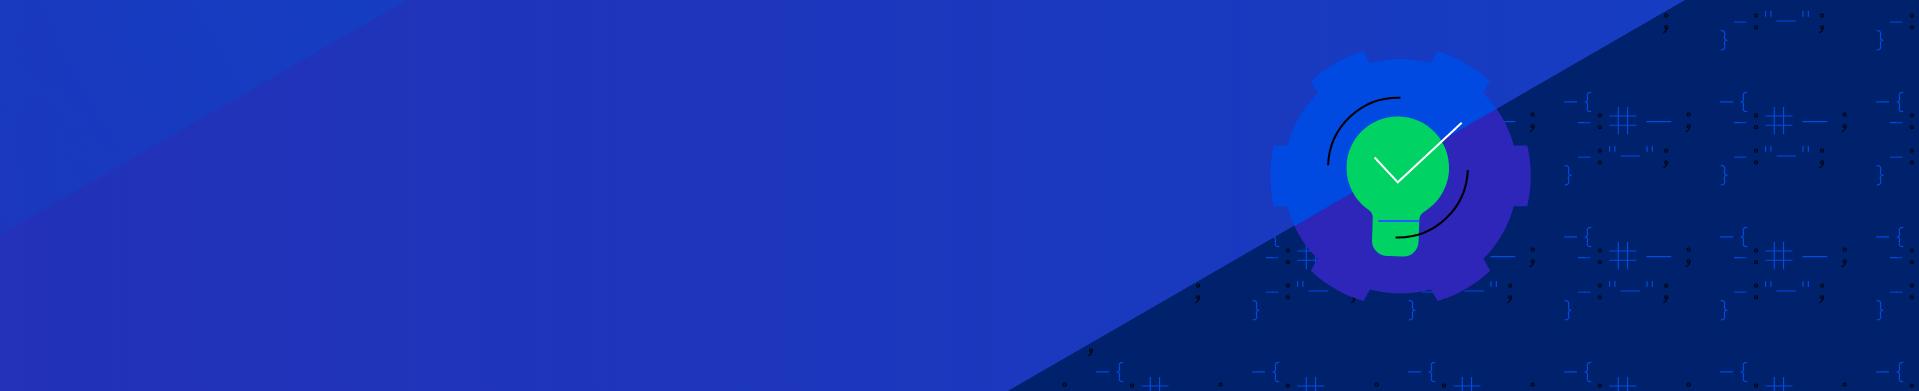 abl-hero-banner